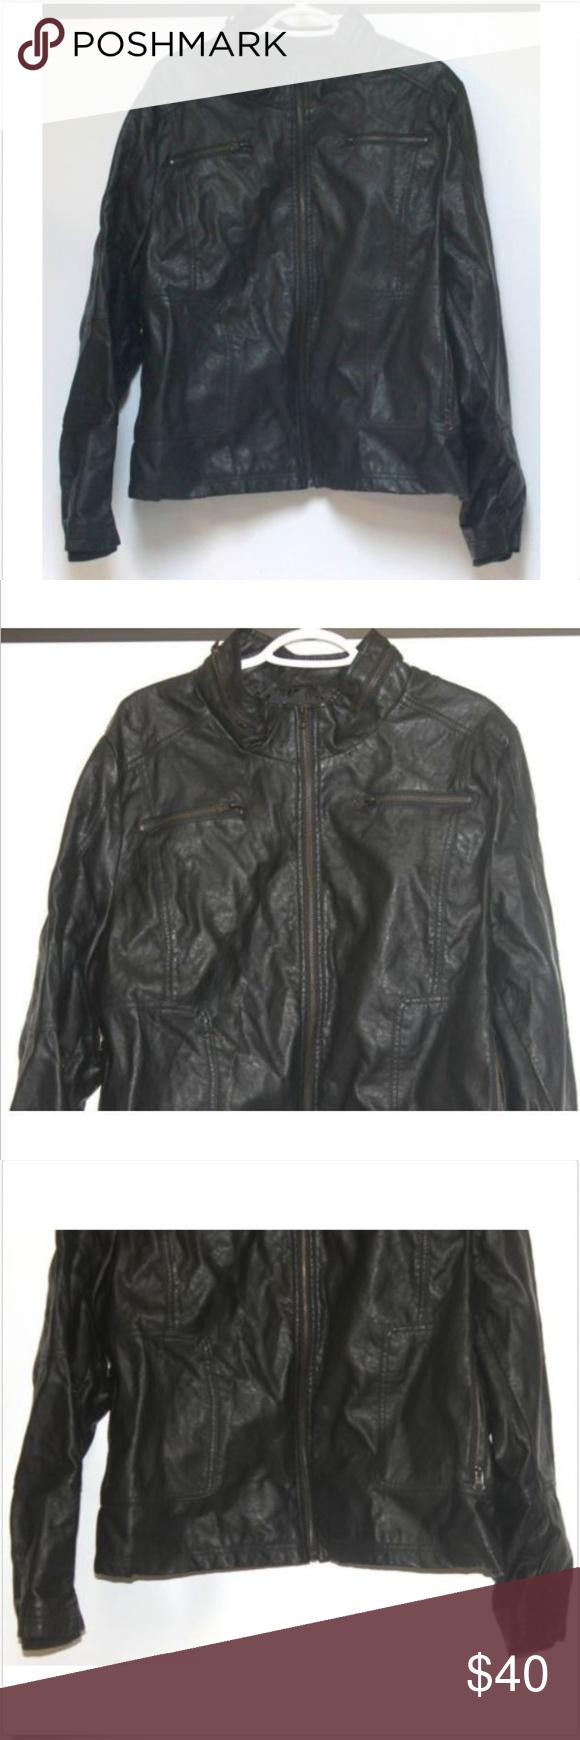 2d9c91b573f01 Lane Bryant Vegan Faux Leather Jacket Sz 22 24 Lane Bryant Black Faux  Leather Jacket